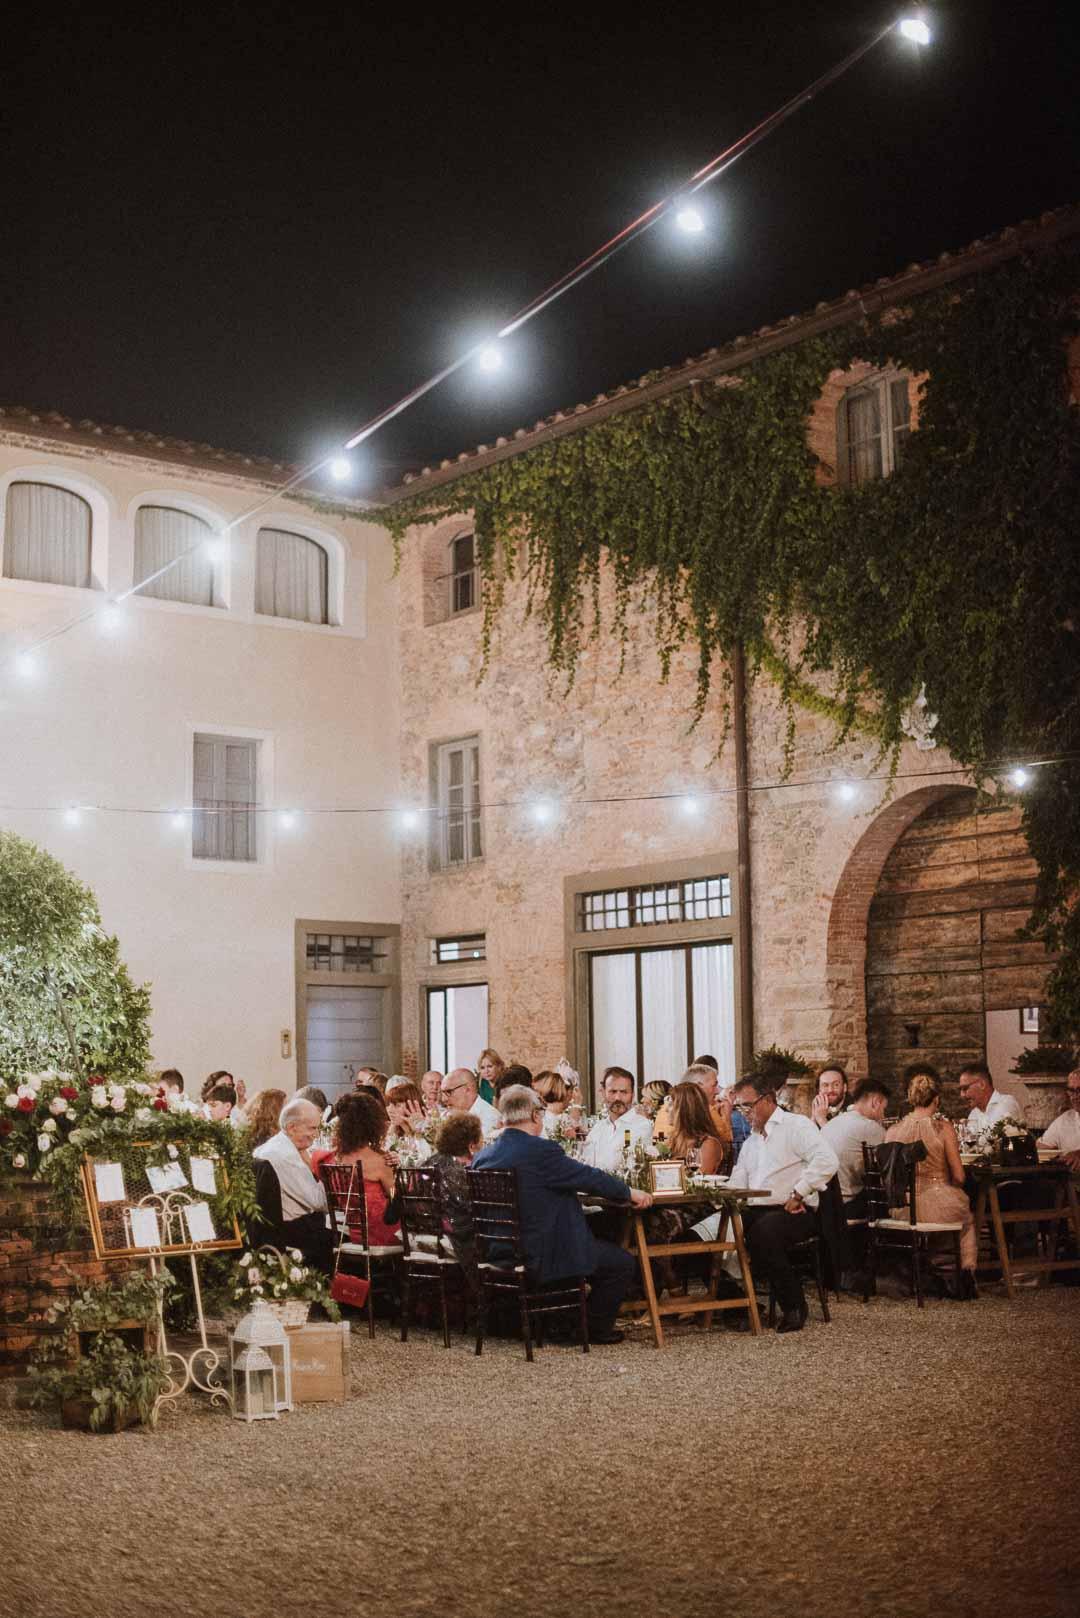 wedding-photographer-destination-fineart-bespoke-reportage-tuscany-villascorzi-vivianeizzo-spazio46-171